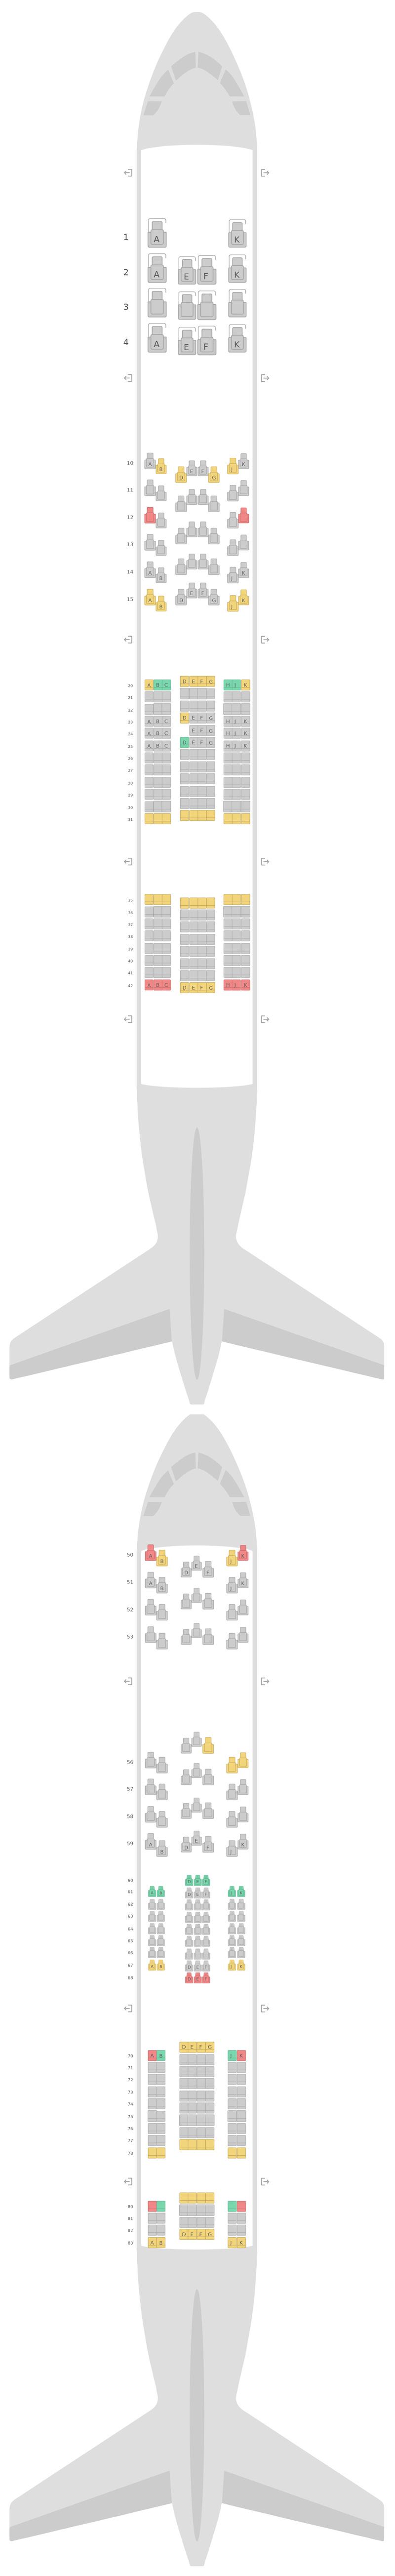 Схема салона Аэробус А380-800 (388) Бритиш Эйрвейз